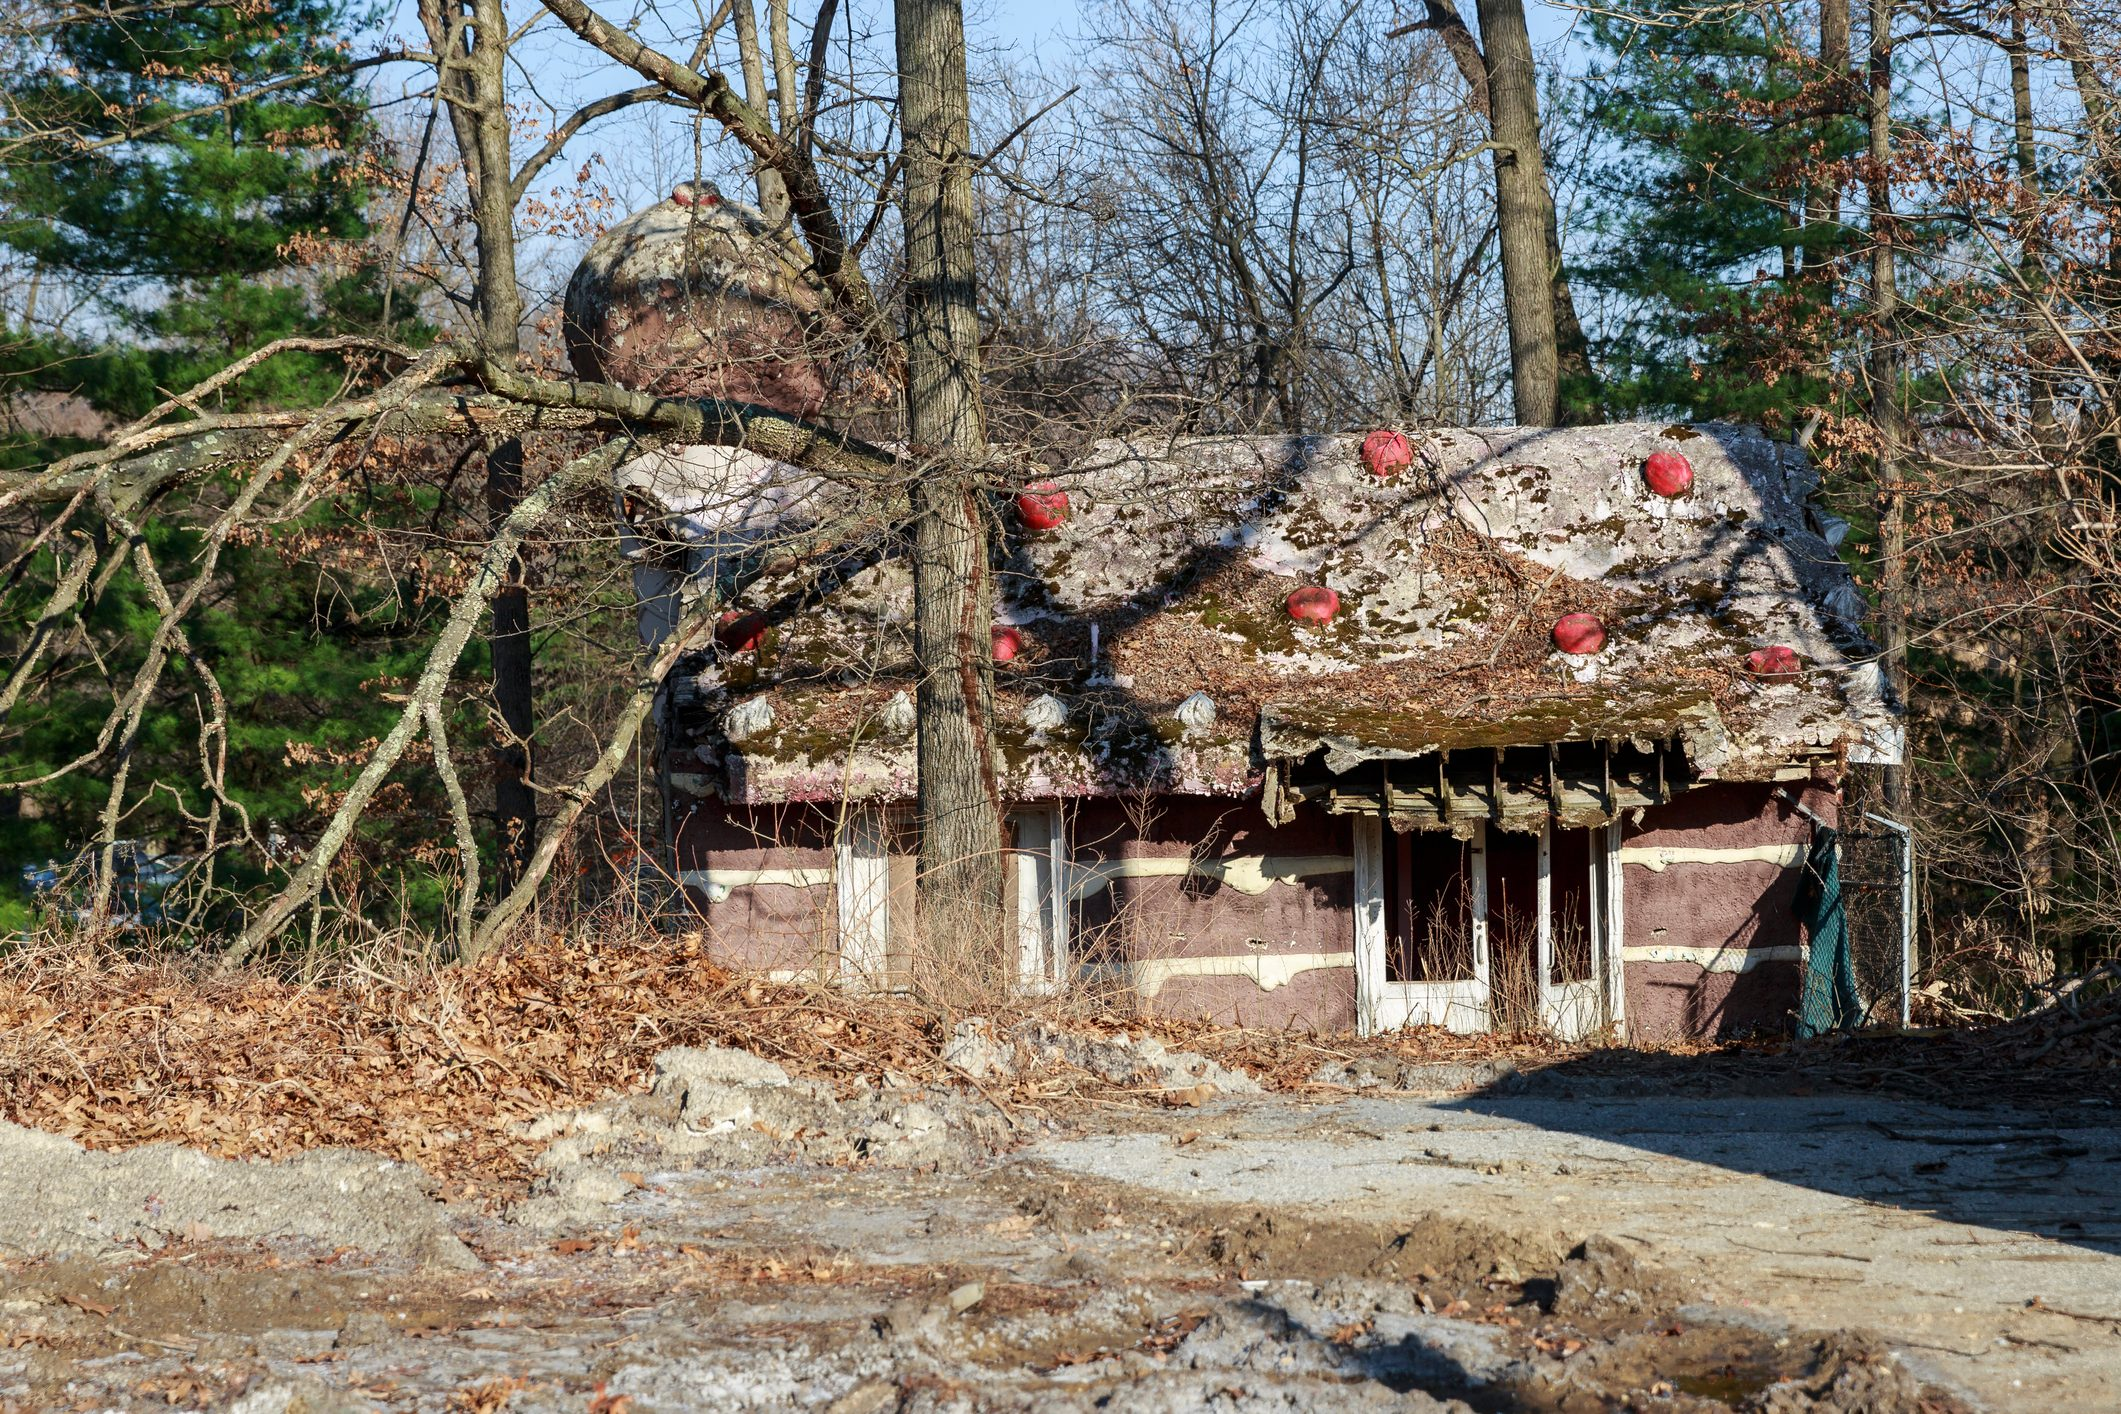 Enchanted Forest Abandoned Amusement Park Ice Cream Shop